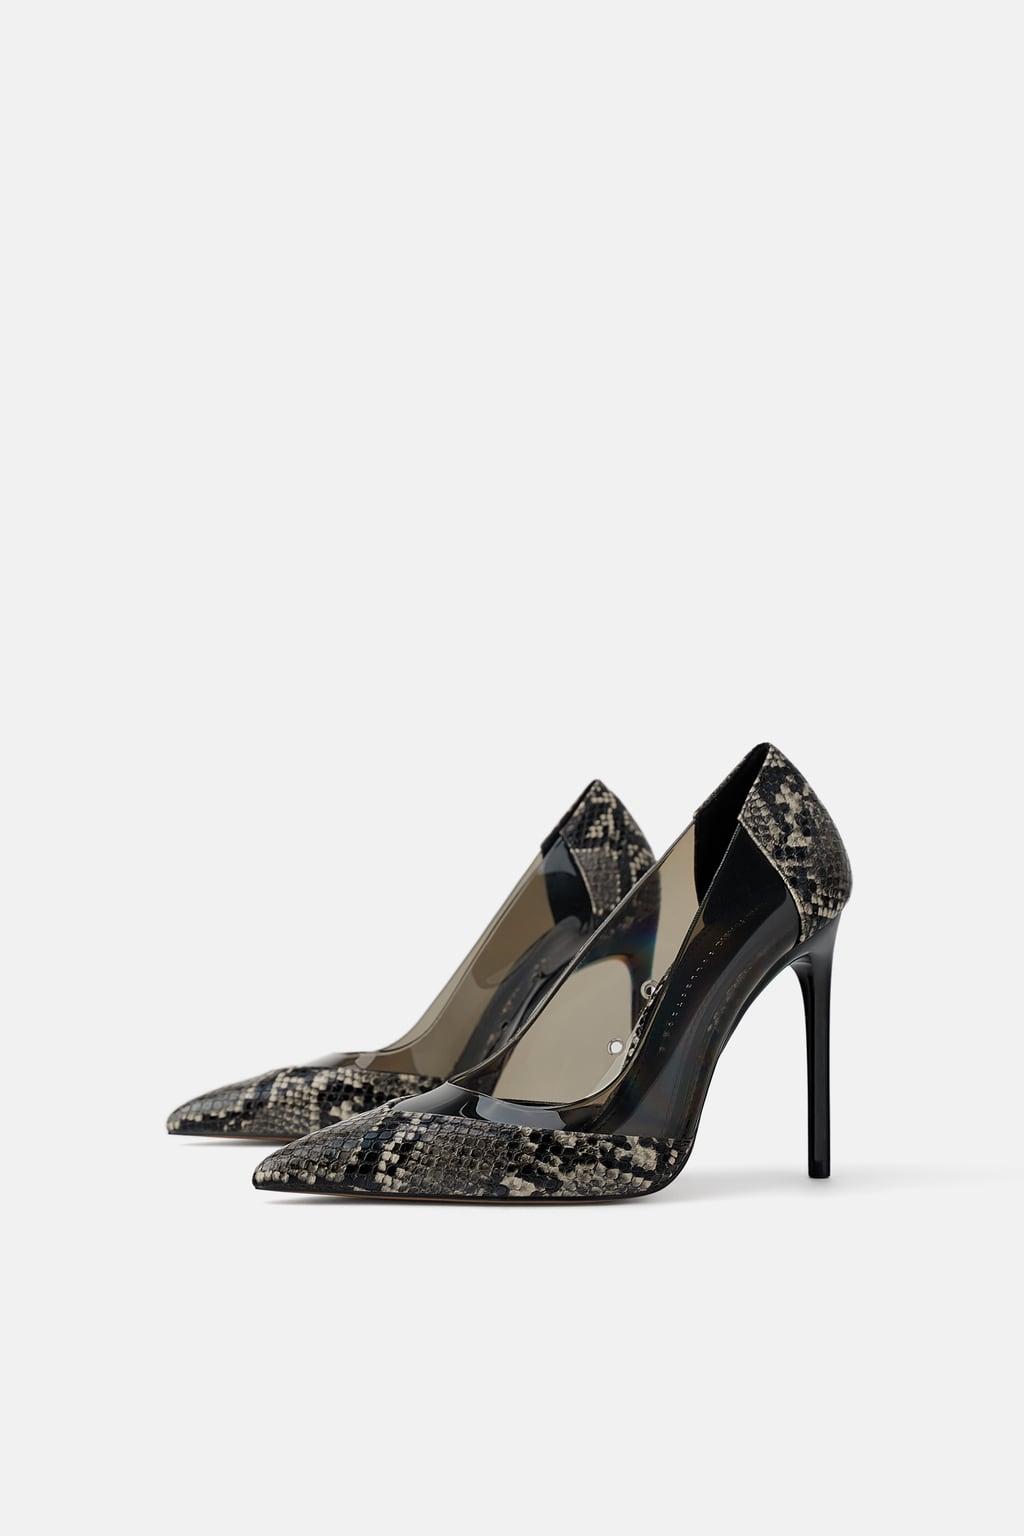 snake print heels from Zara